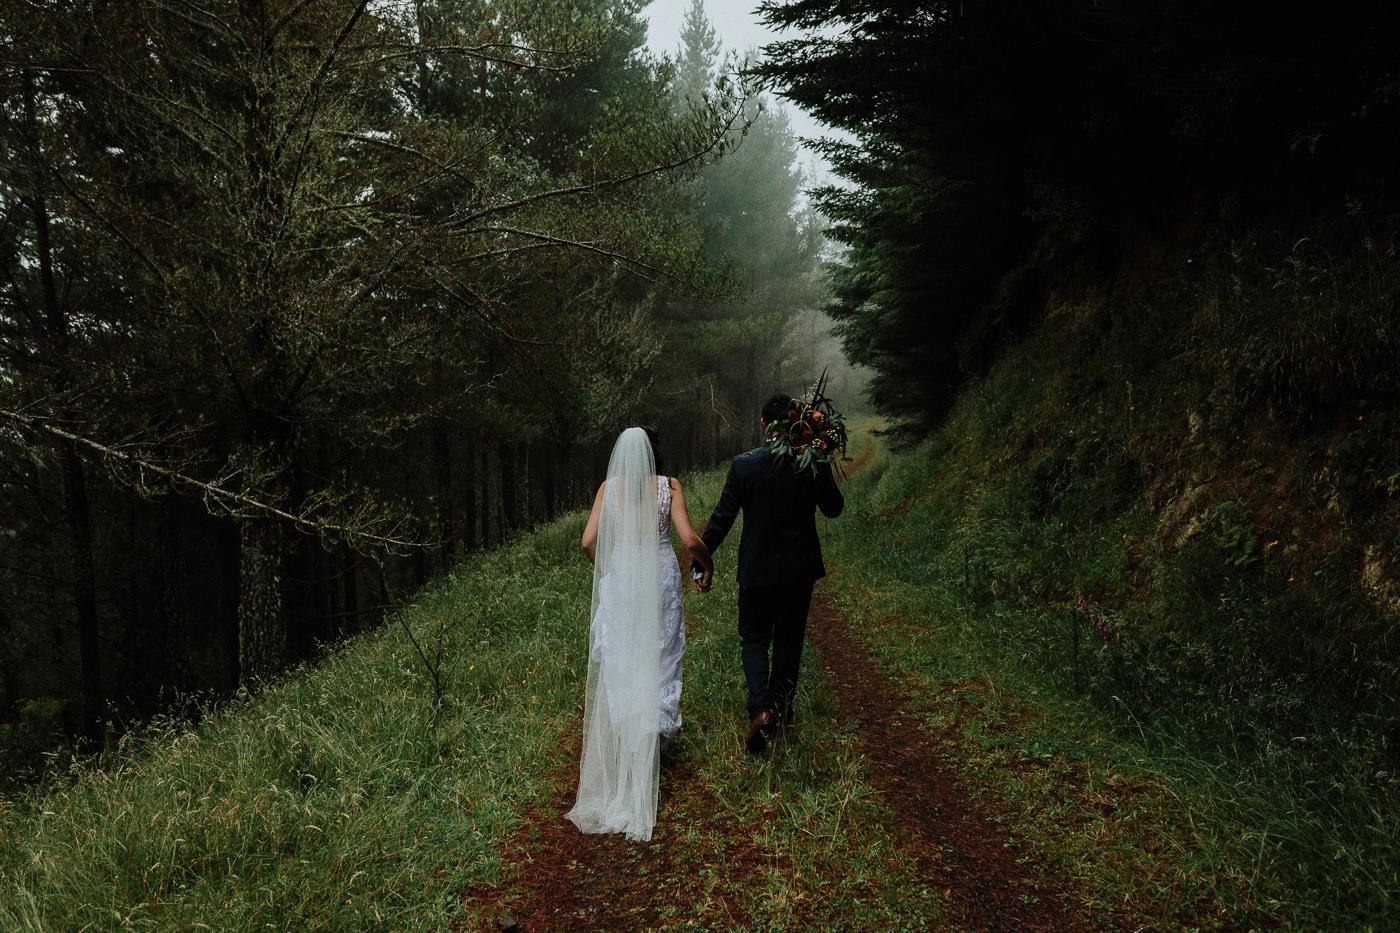 nz_wedding_photographer_gisborne-1074a.jpg